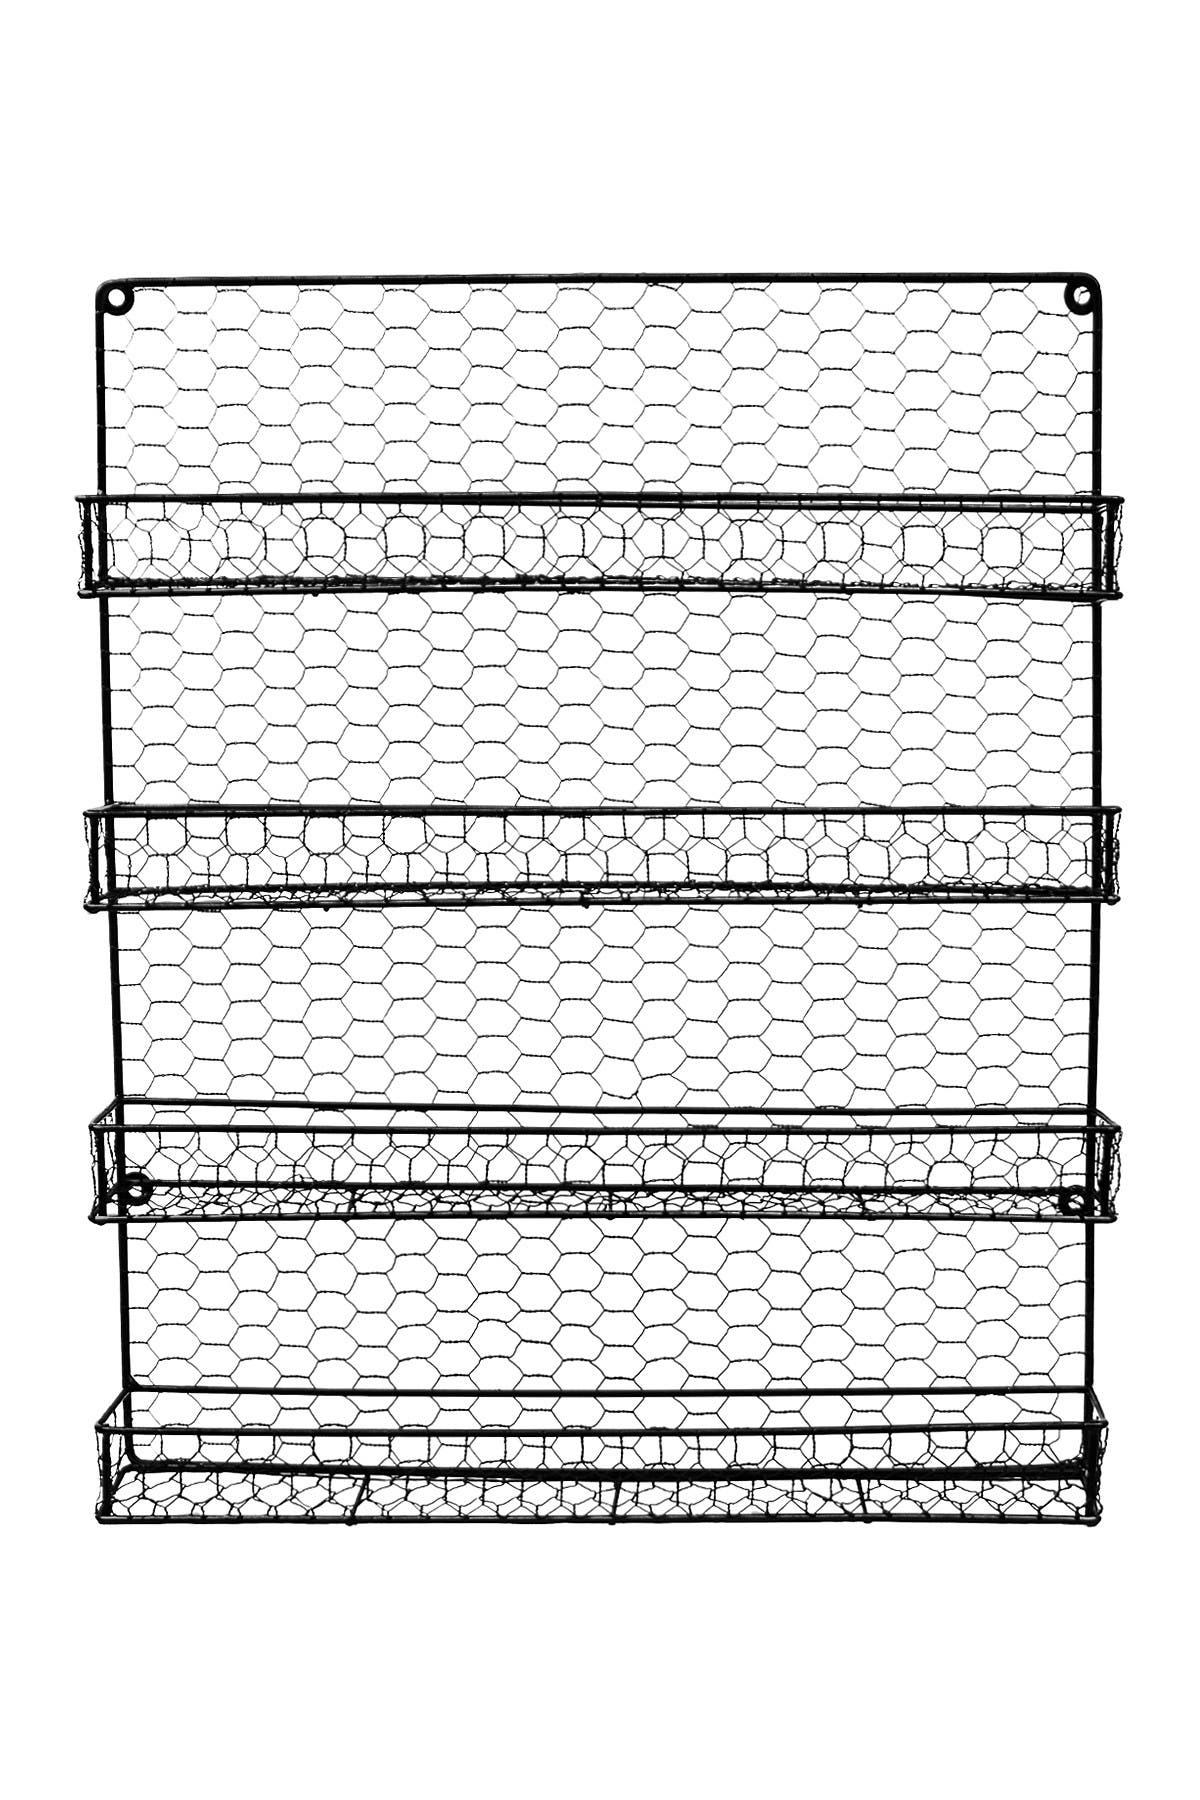 Image of Sorbus 4 Tier Wall Mounted Spice Rack Storage Organizer - Black